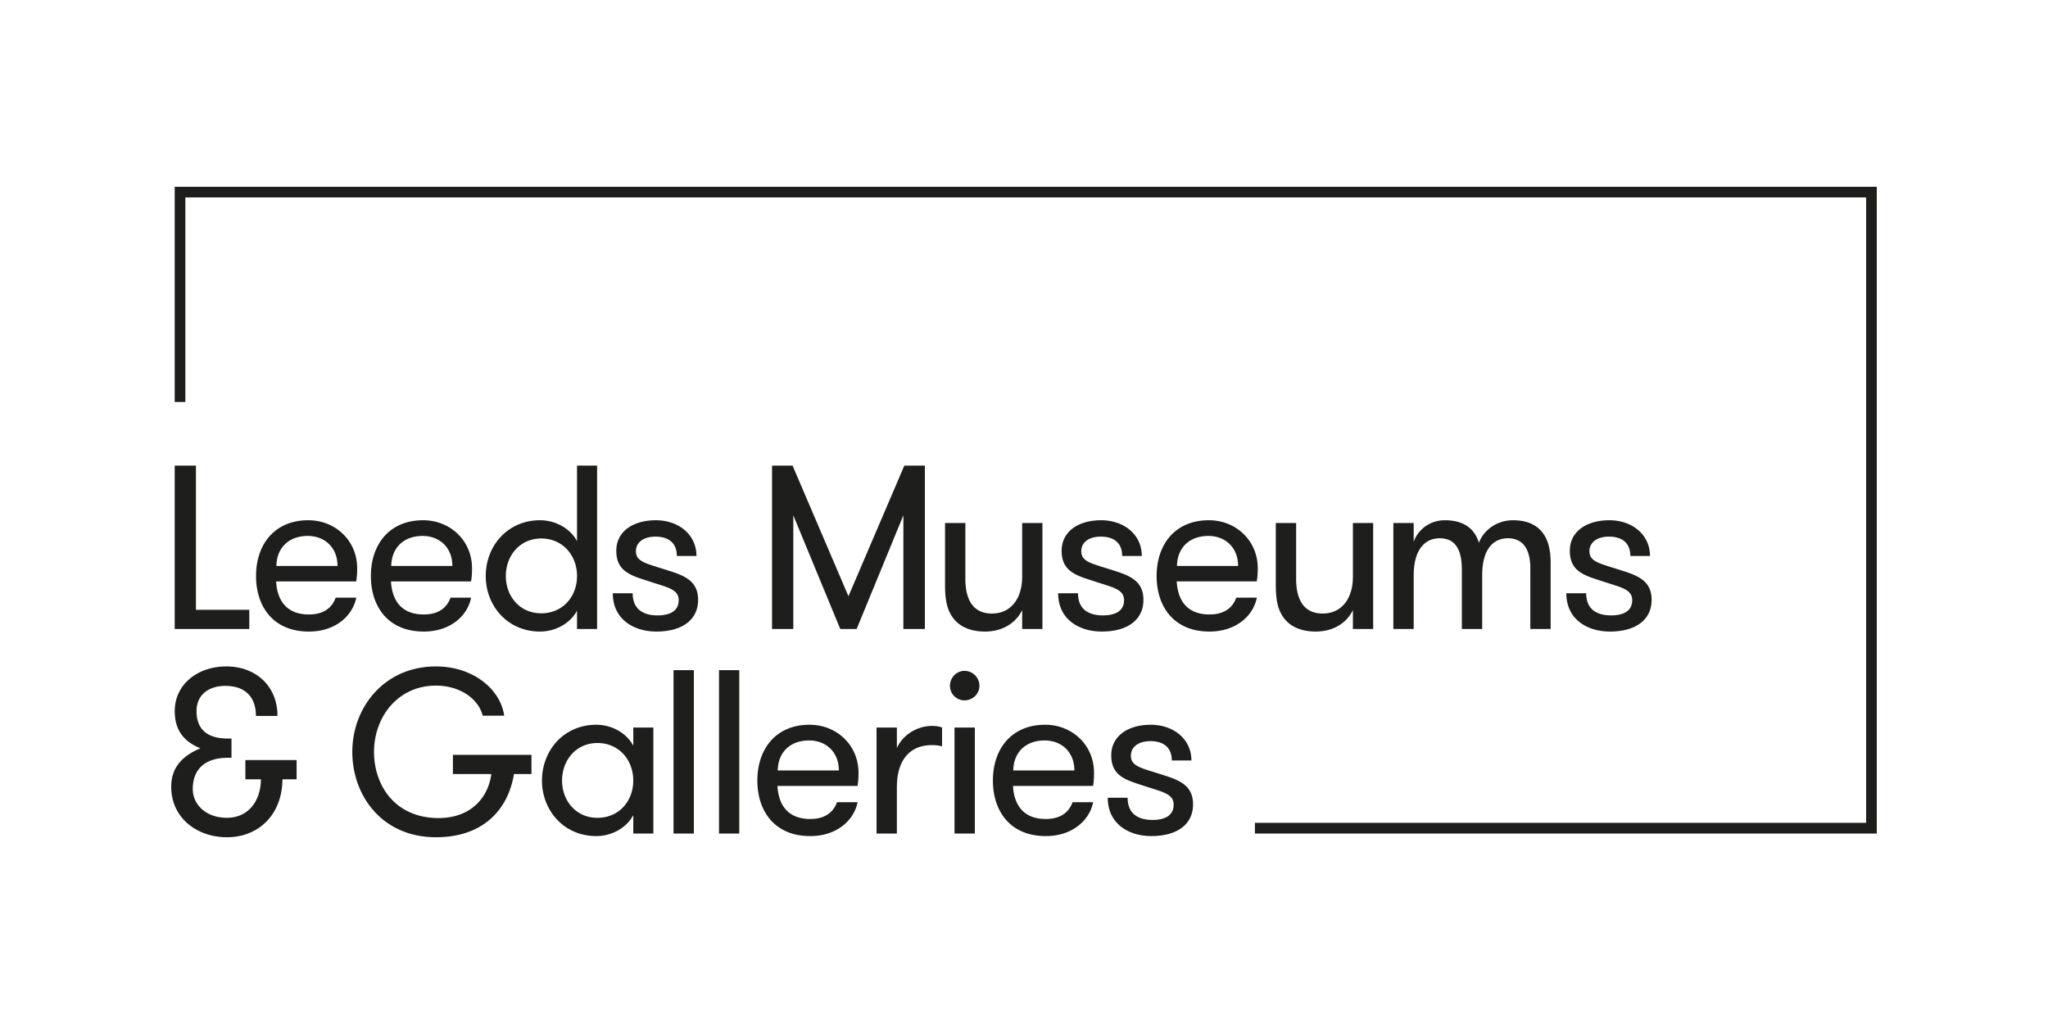 Leeds Musuems & Galleries